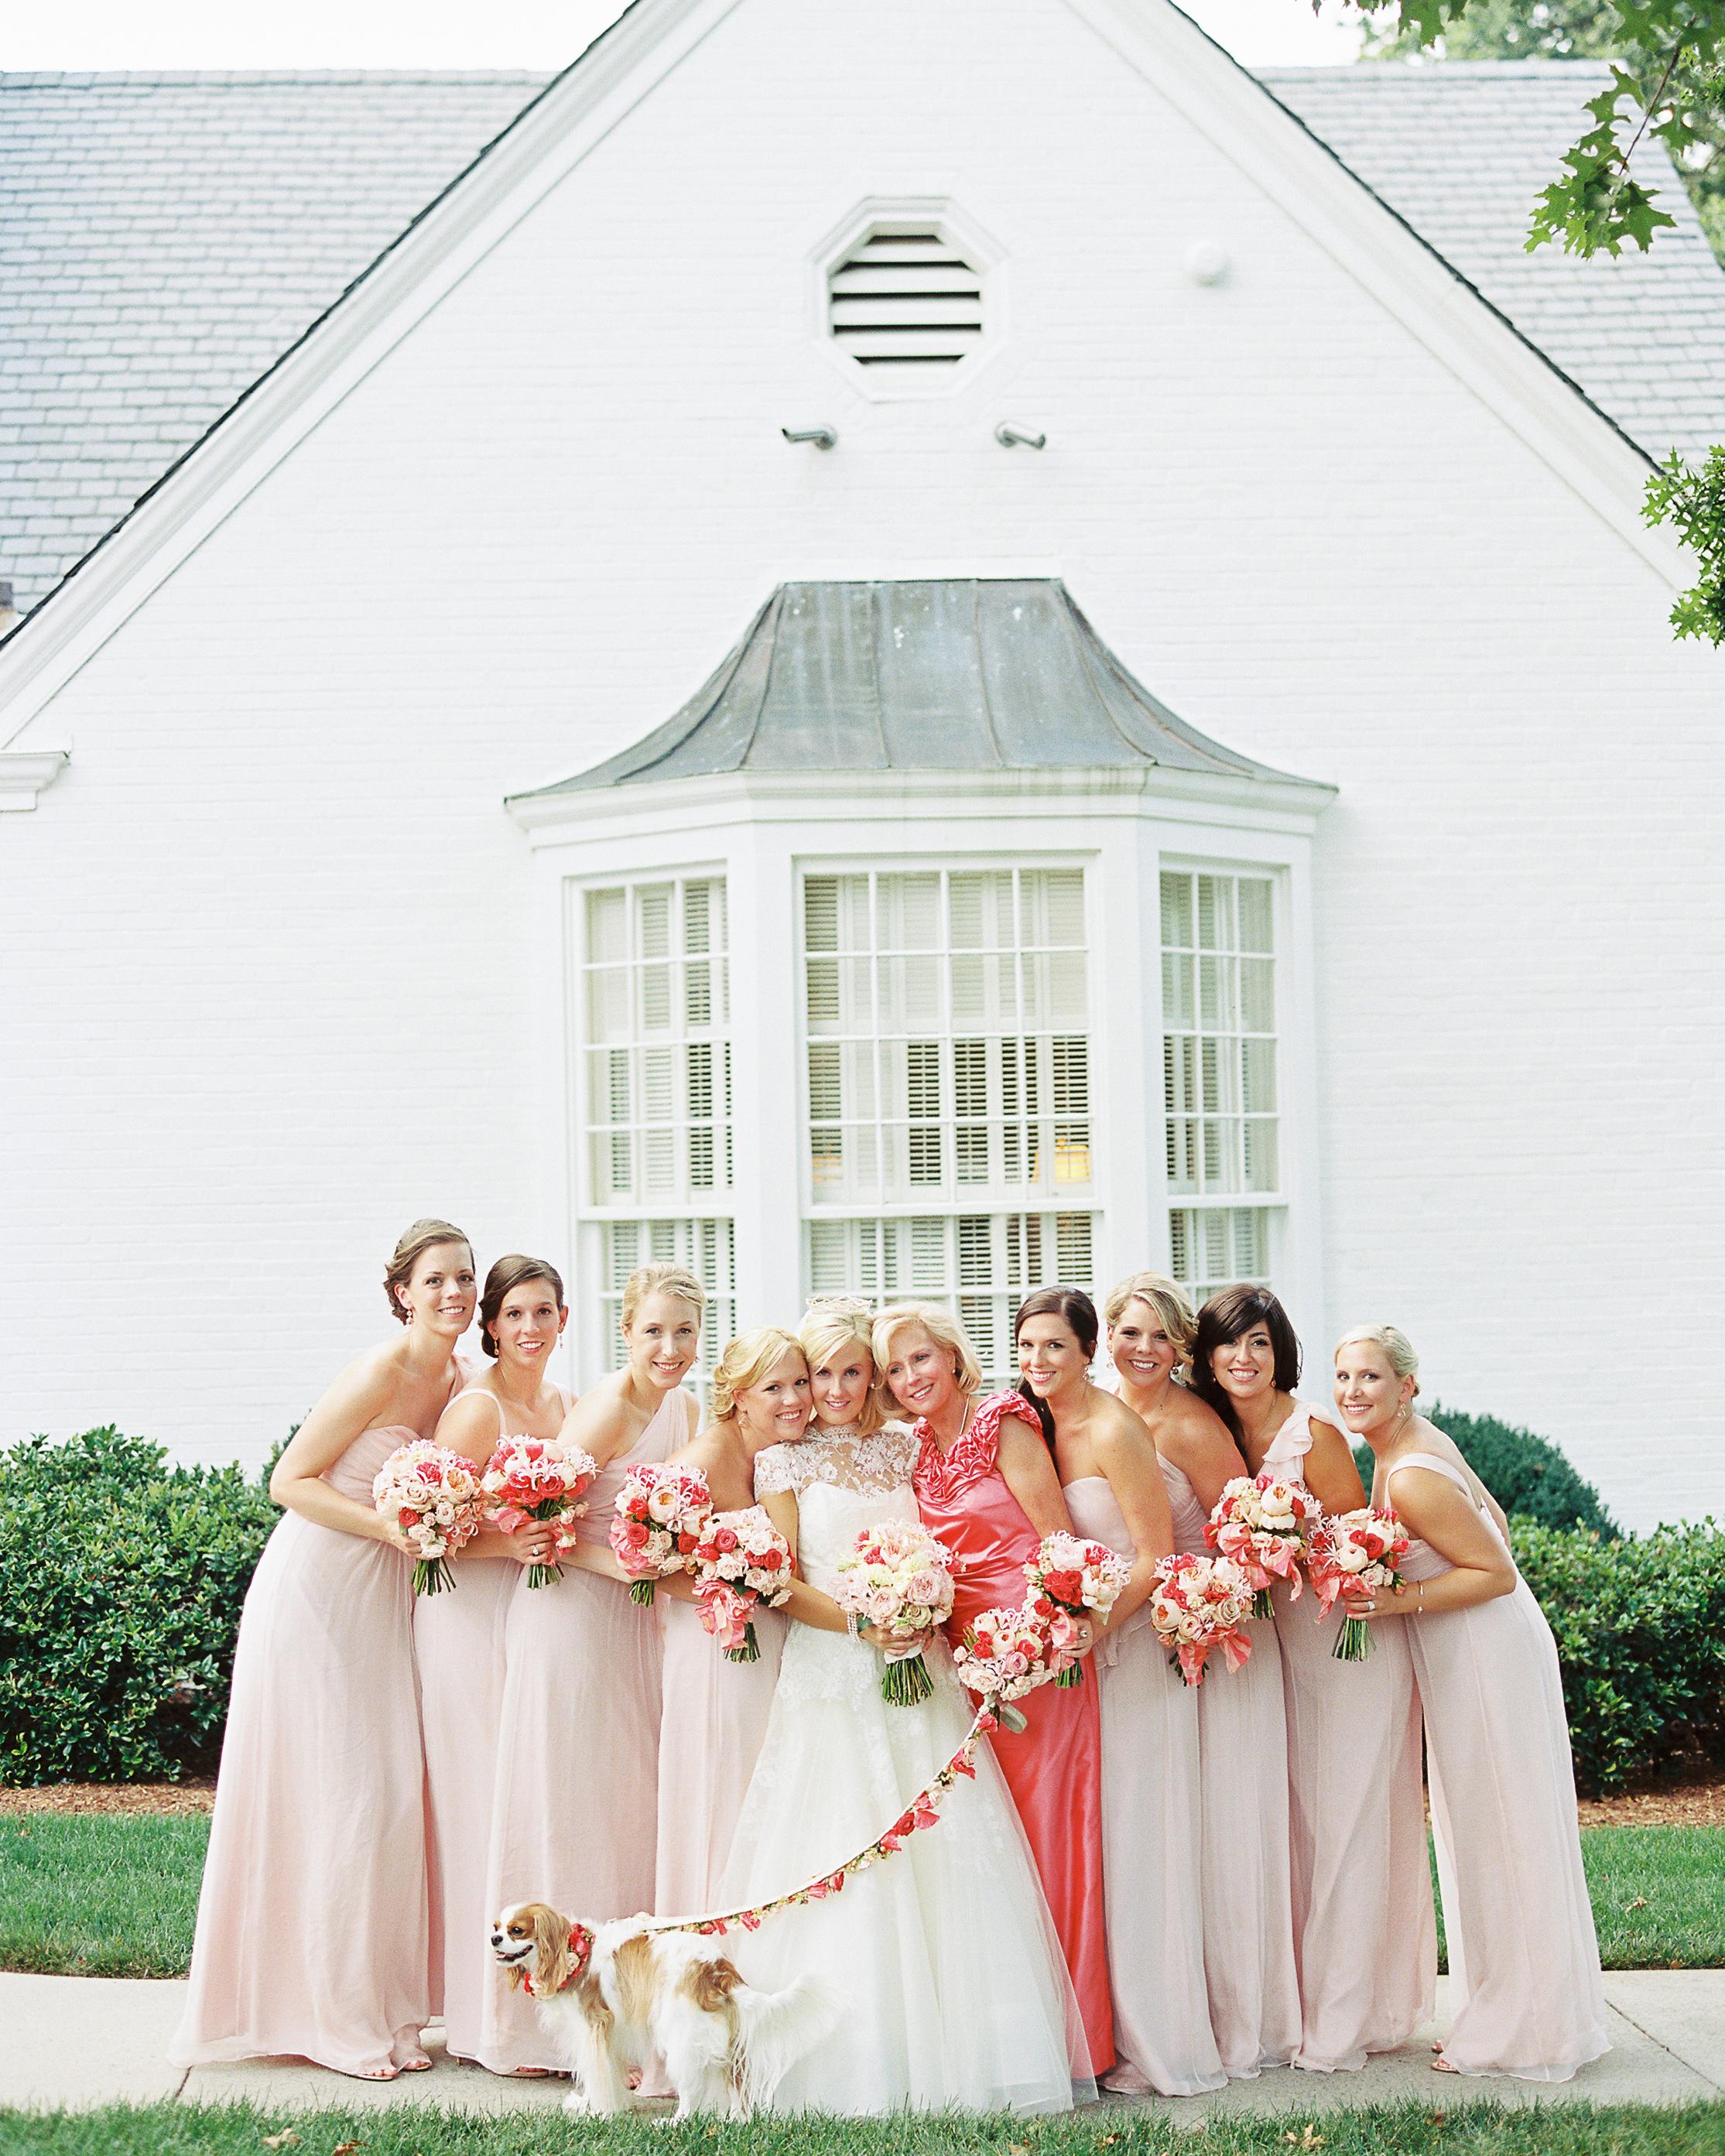 molly-patrick-wedding-bridesmaids-3255-s111760-0115.jpg